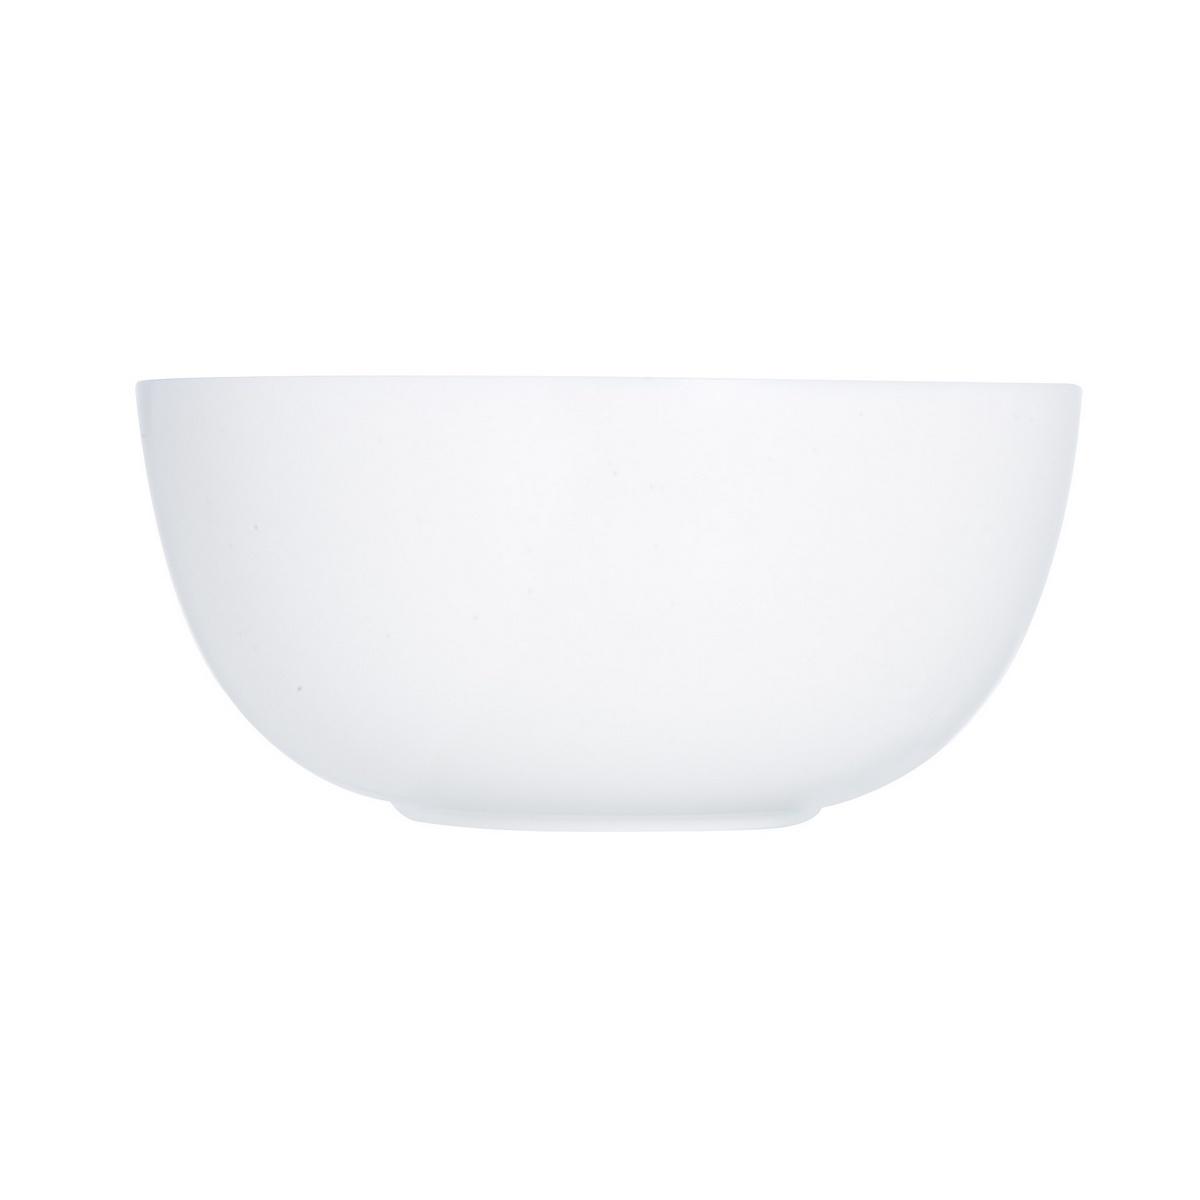 Mäser Miska Diwali, 12 cm, biela